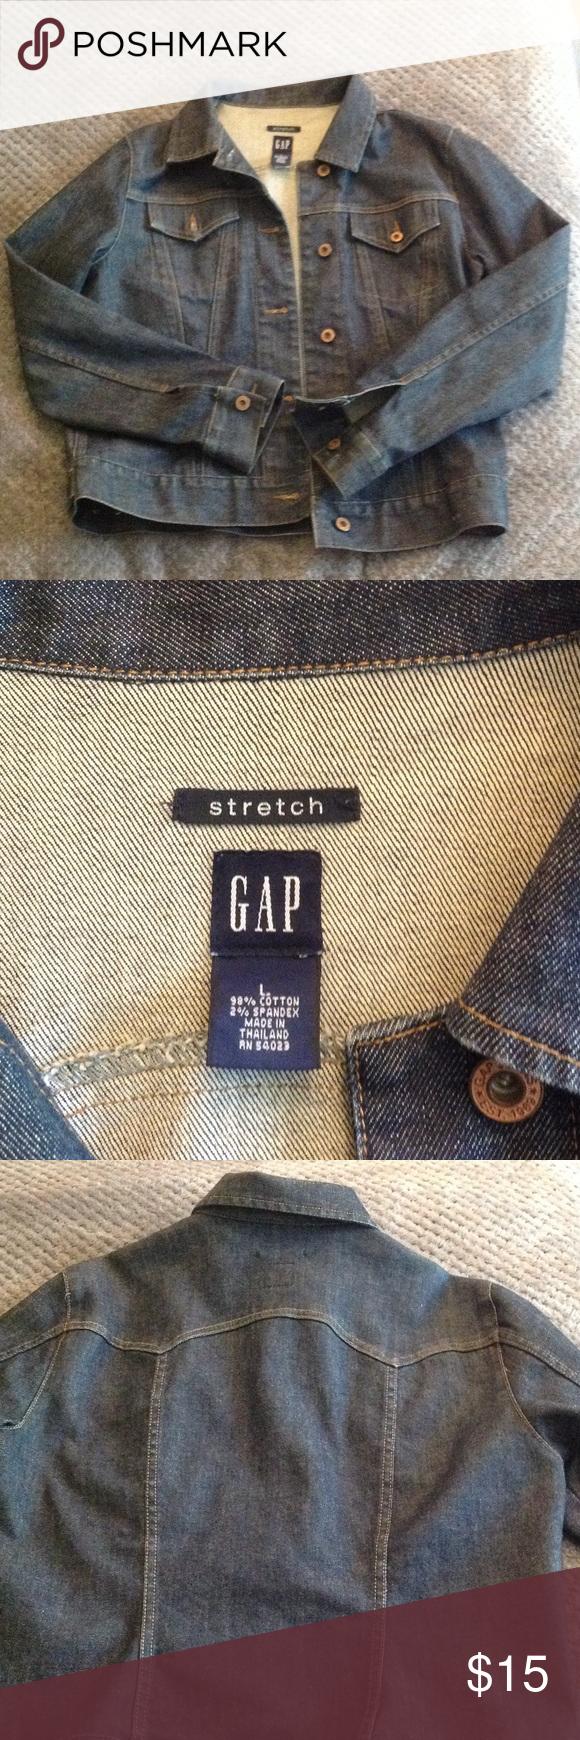 Gap Jean Jacket Gap Jean Jacket Large in Superb condition GAP Jackets & Coats Jean Jackets